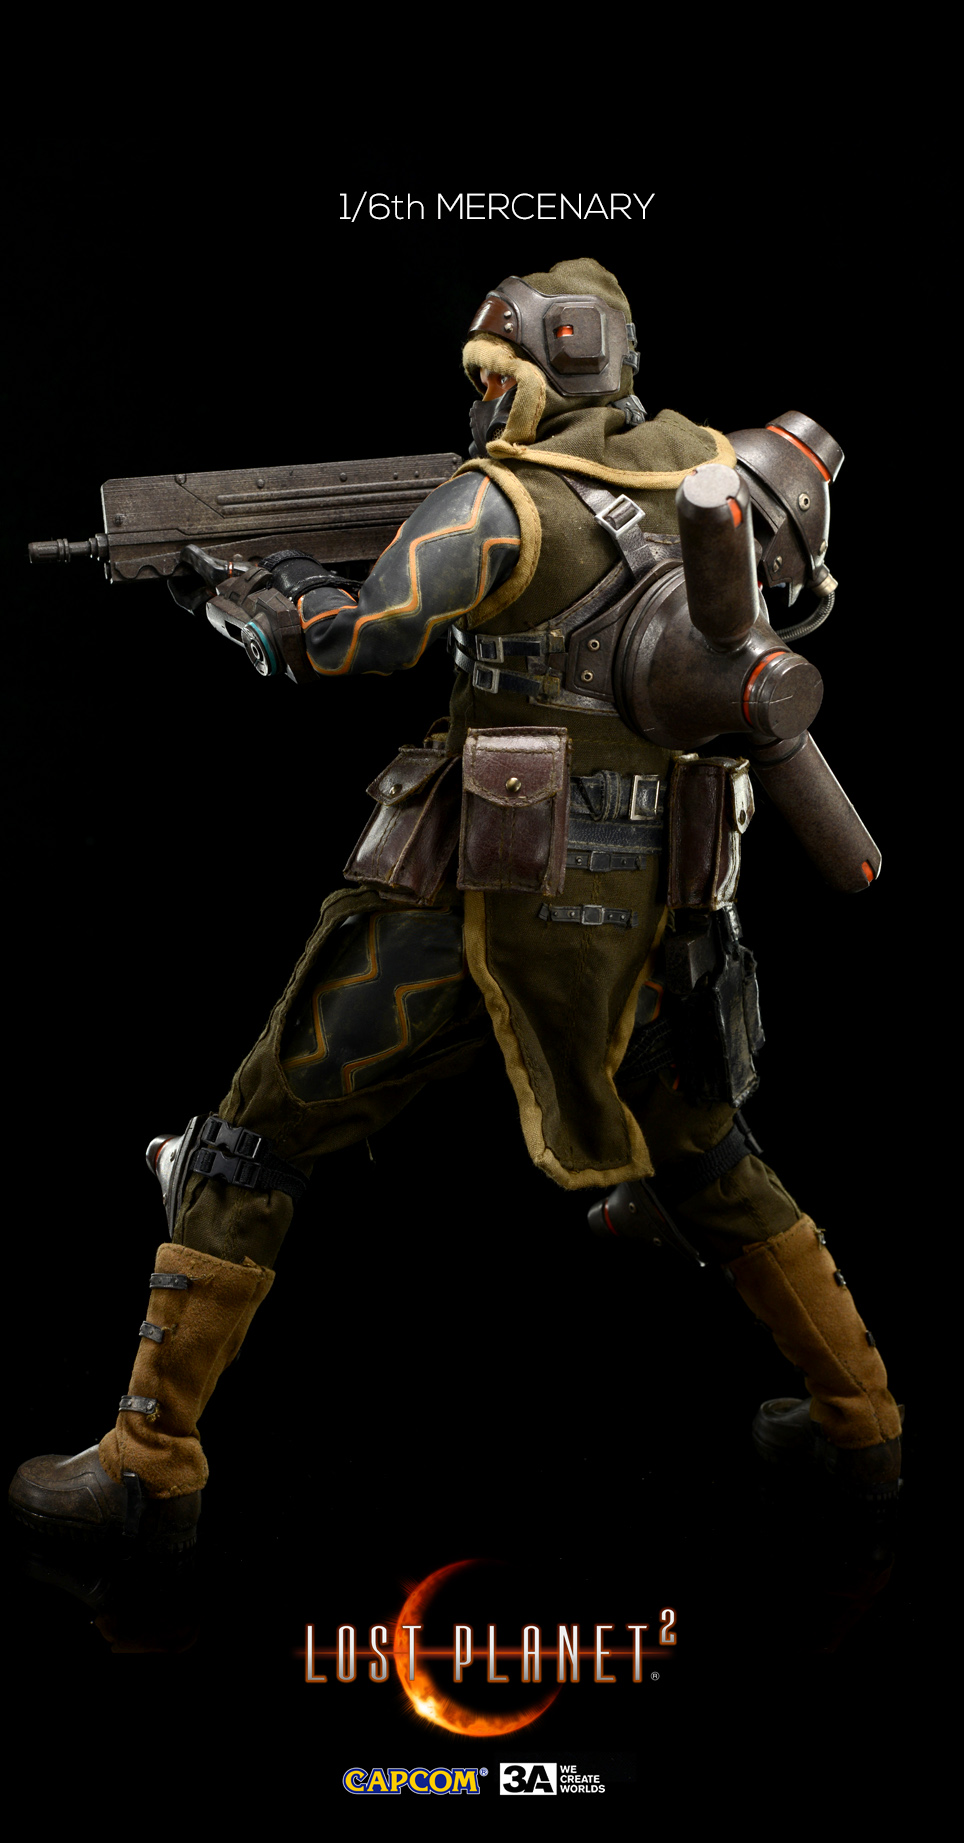 3A-Lost-Planet-Mercenary-video-game-LPM22 1_o-1.jpg